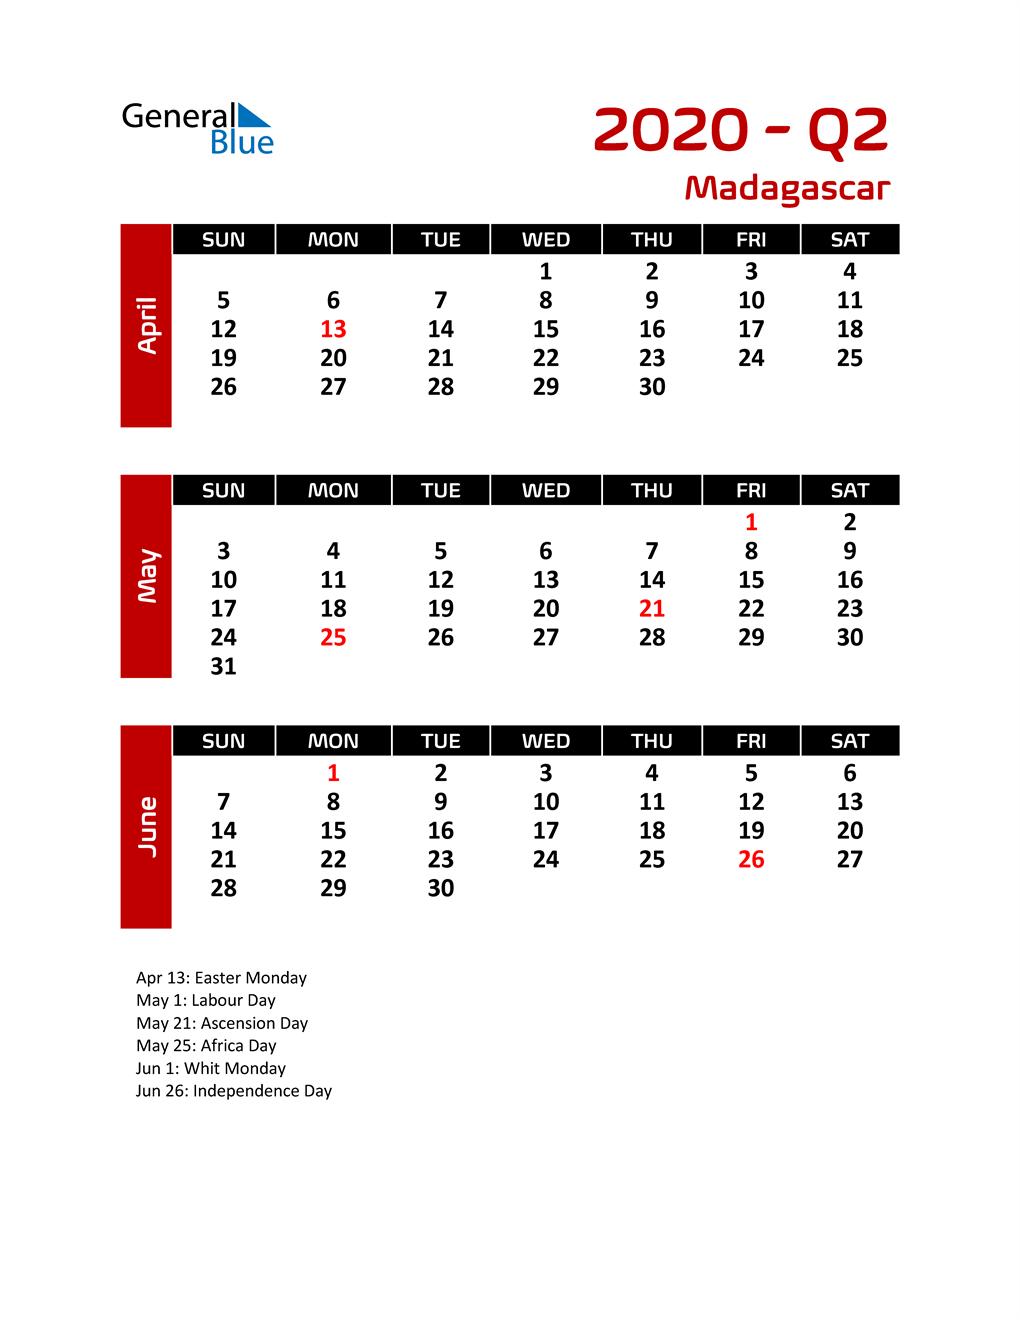 Q2 2020 Calendar with Holidays